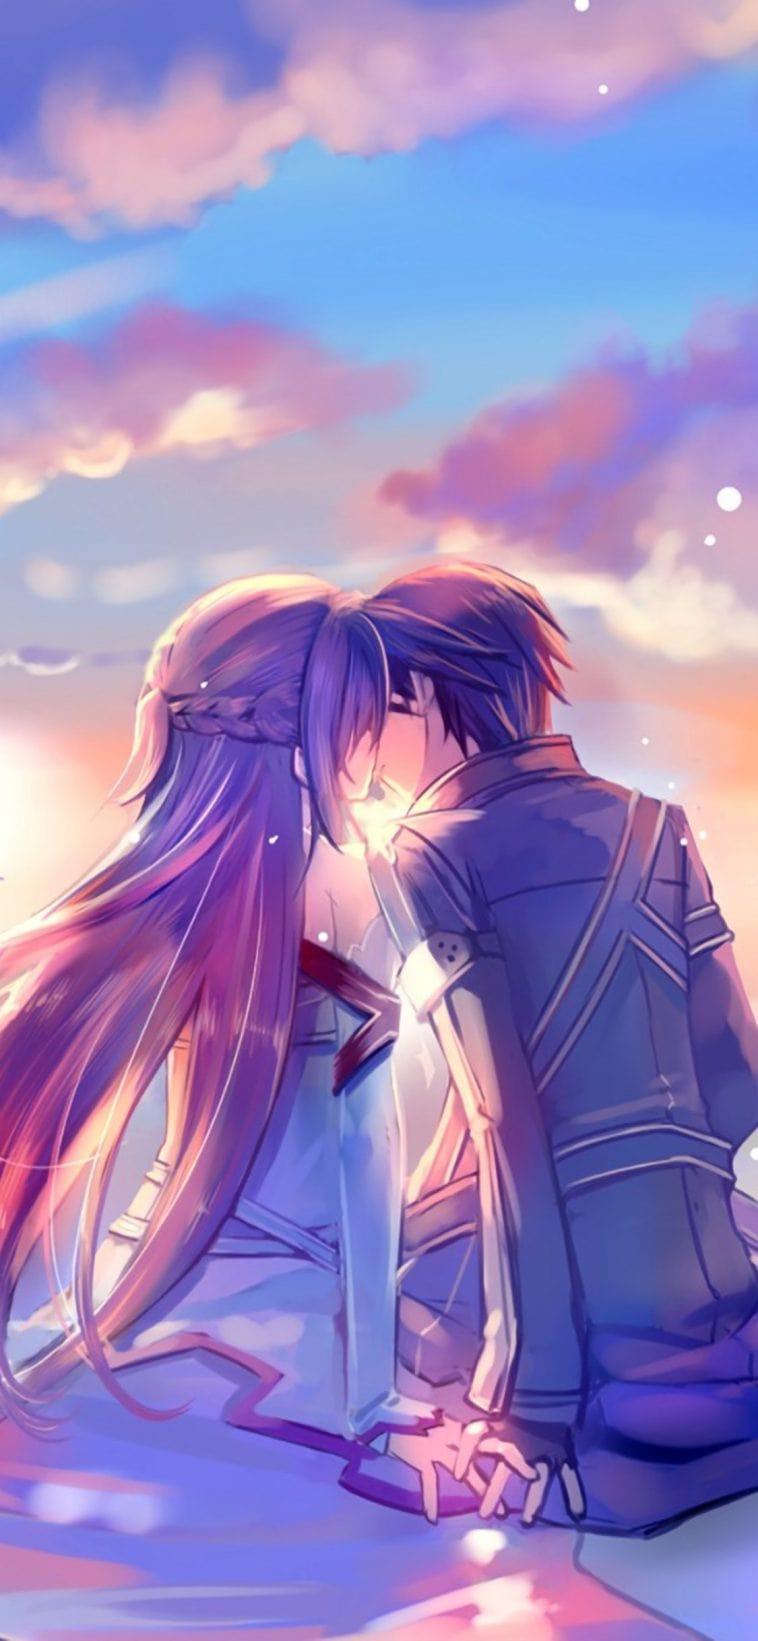 Anime Love Wallpaper : anime, wallpaper, Anime, Wallpapers, Wallpaper